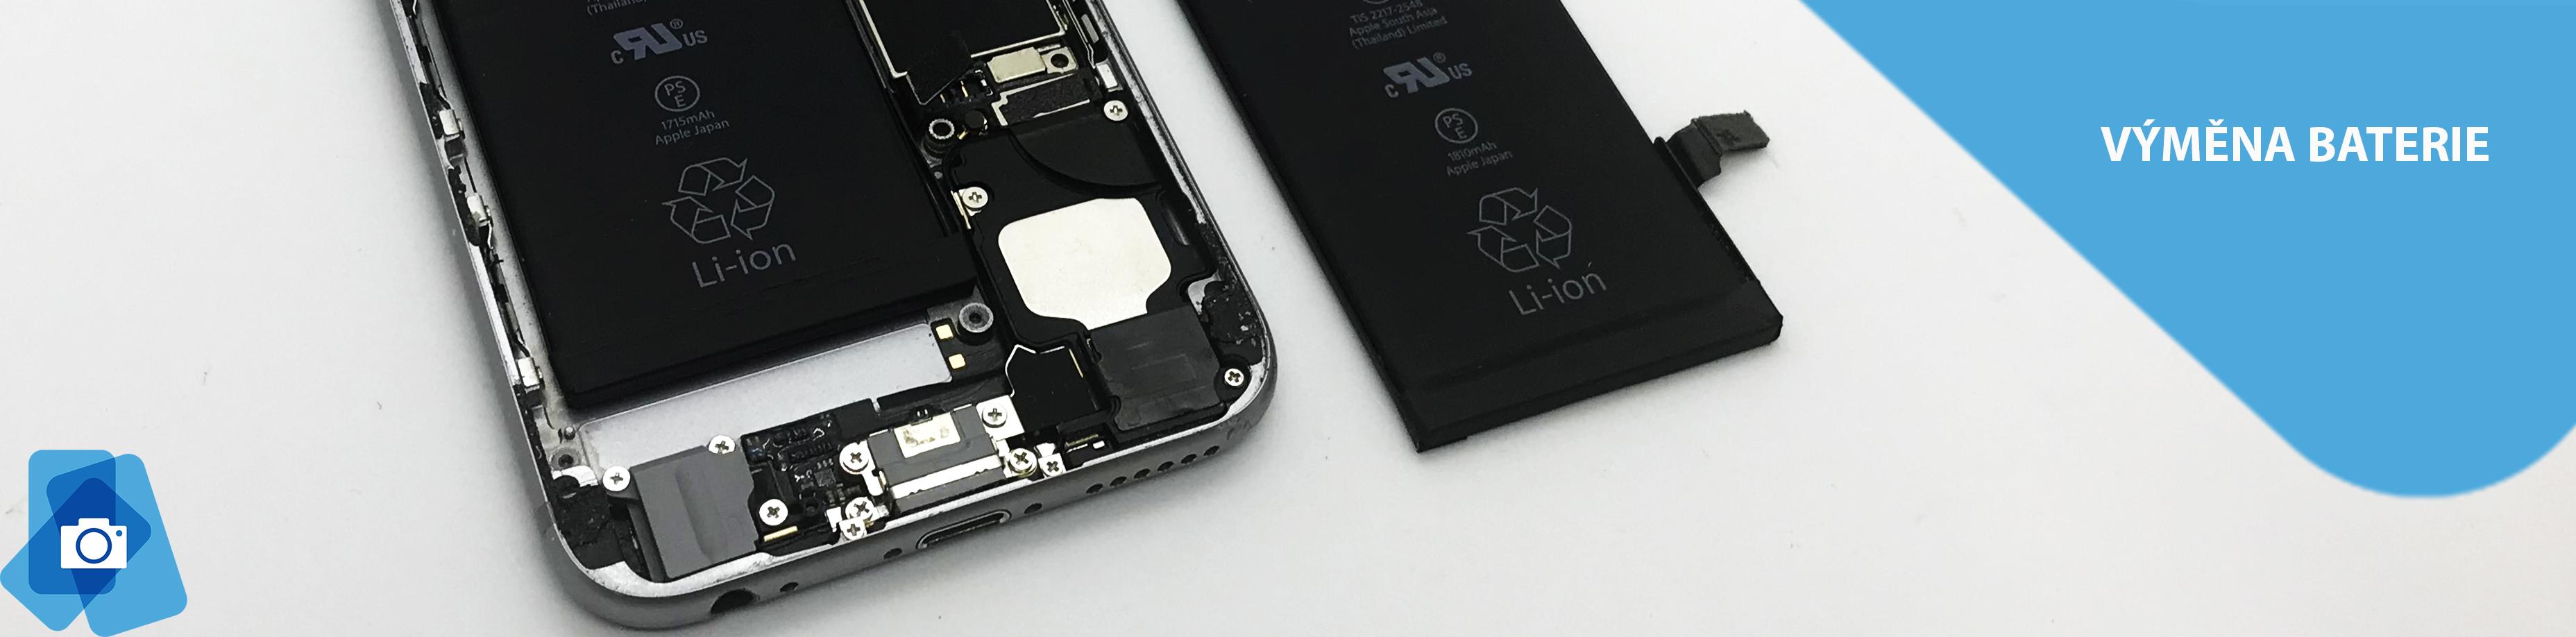 Výměna Baterie iPhone Praha-2